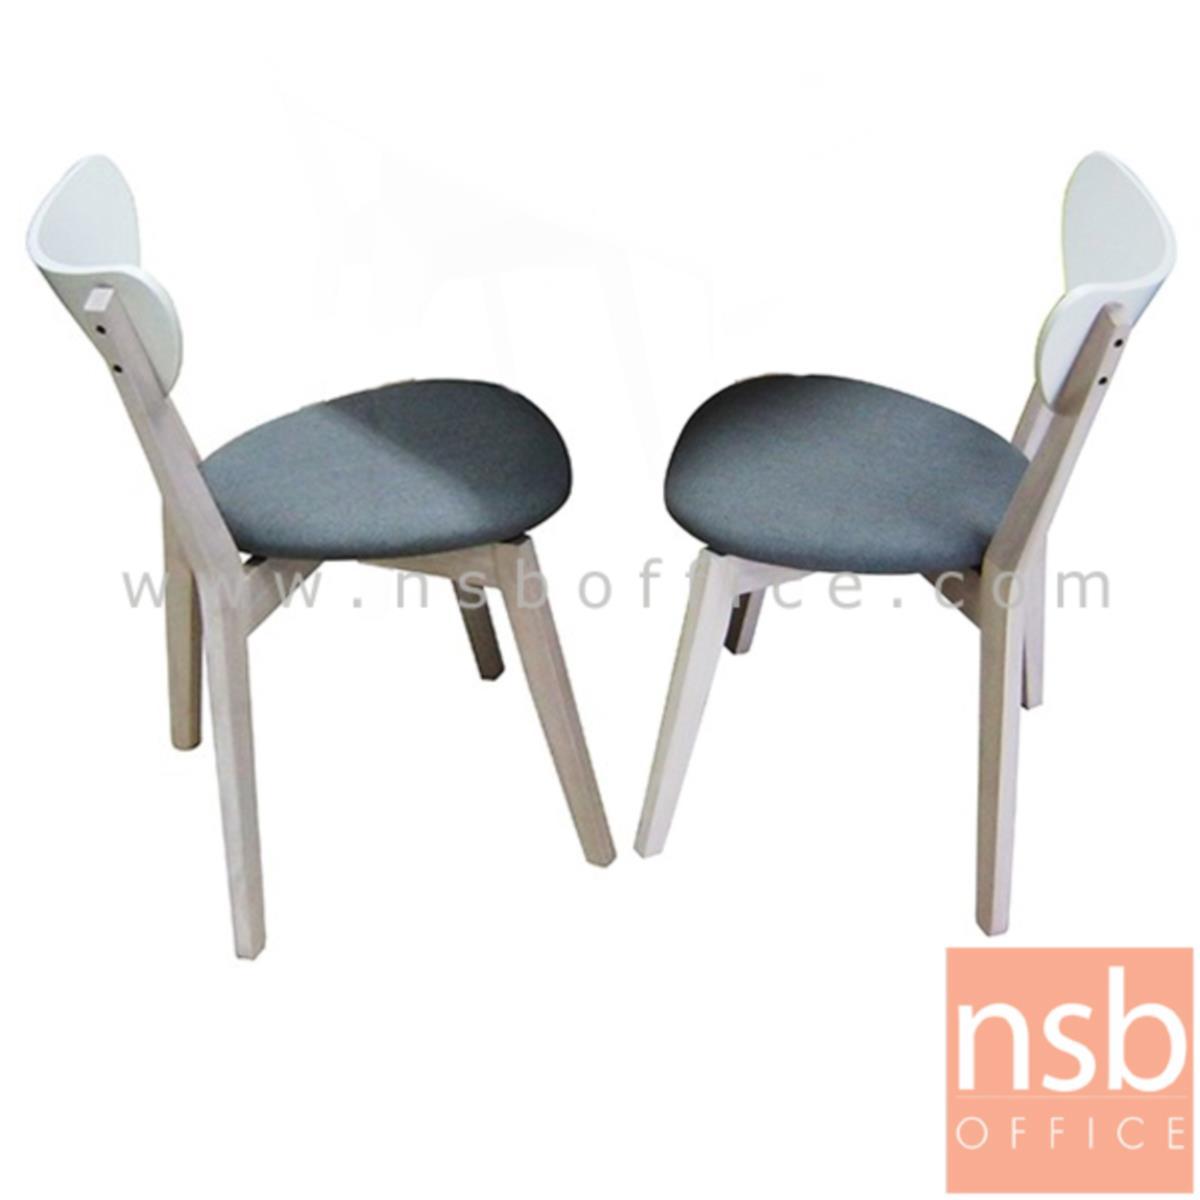 B29A280:เก้าอี้โมเดิร์นหุ้มผ้า รุ่น Haughton (ฮอจตัน) ขนาด 45W cm. โครงขาไม้